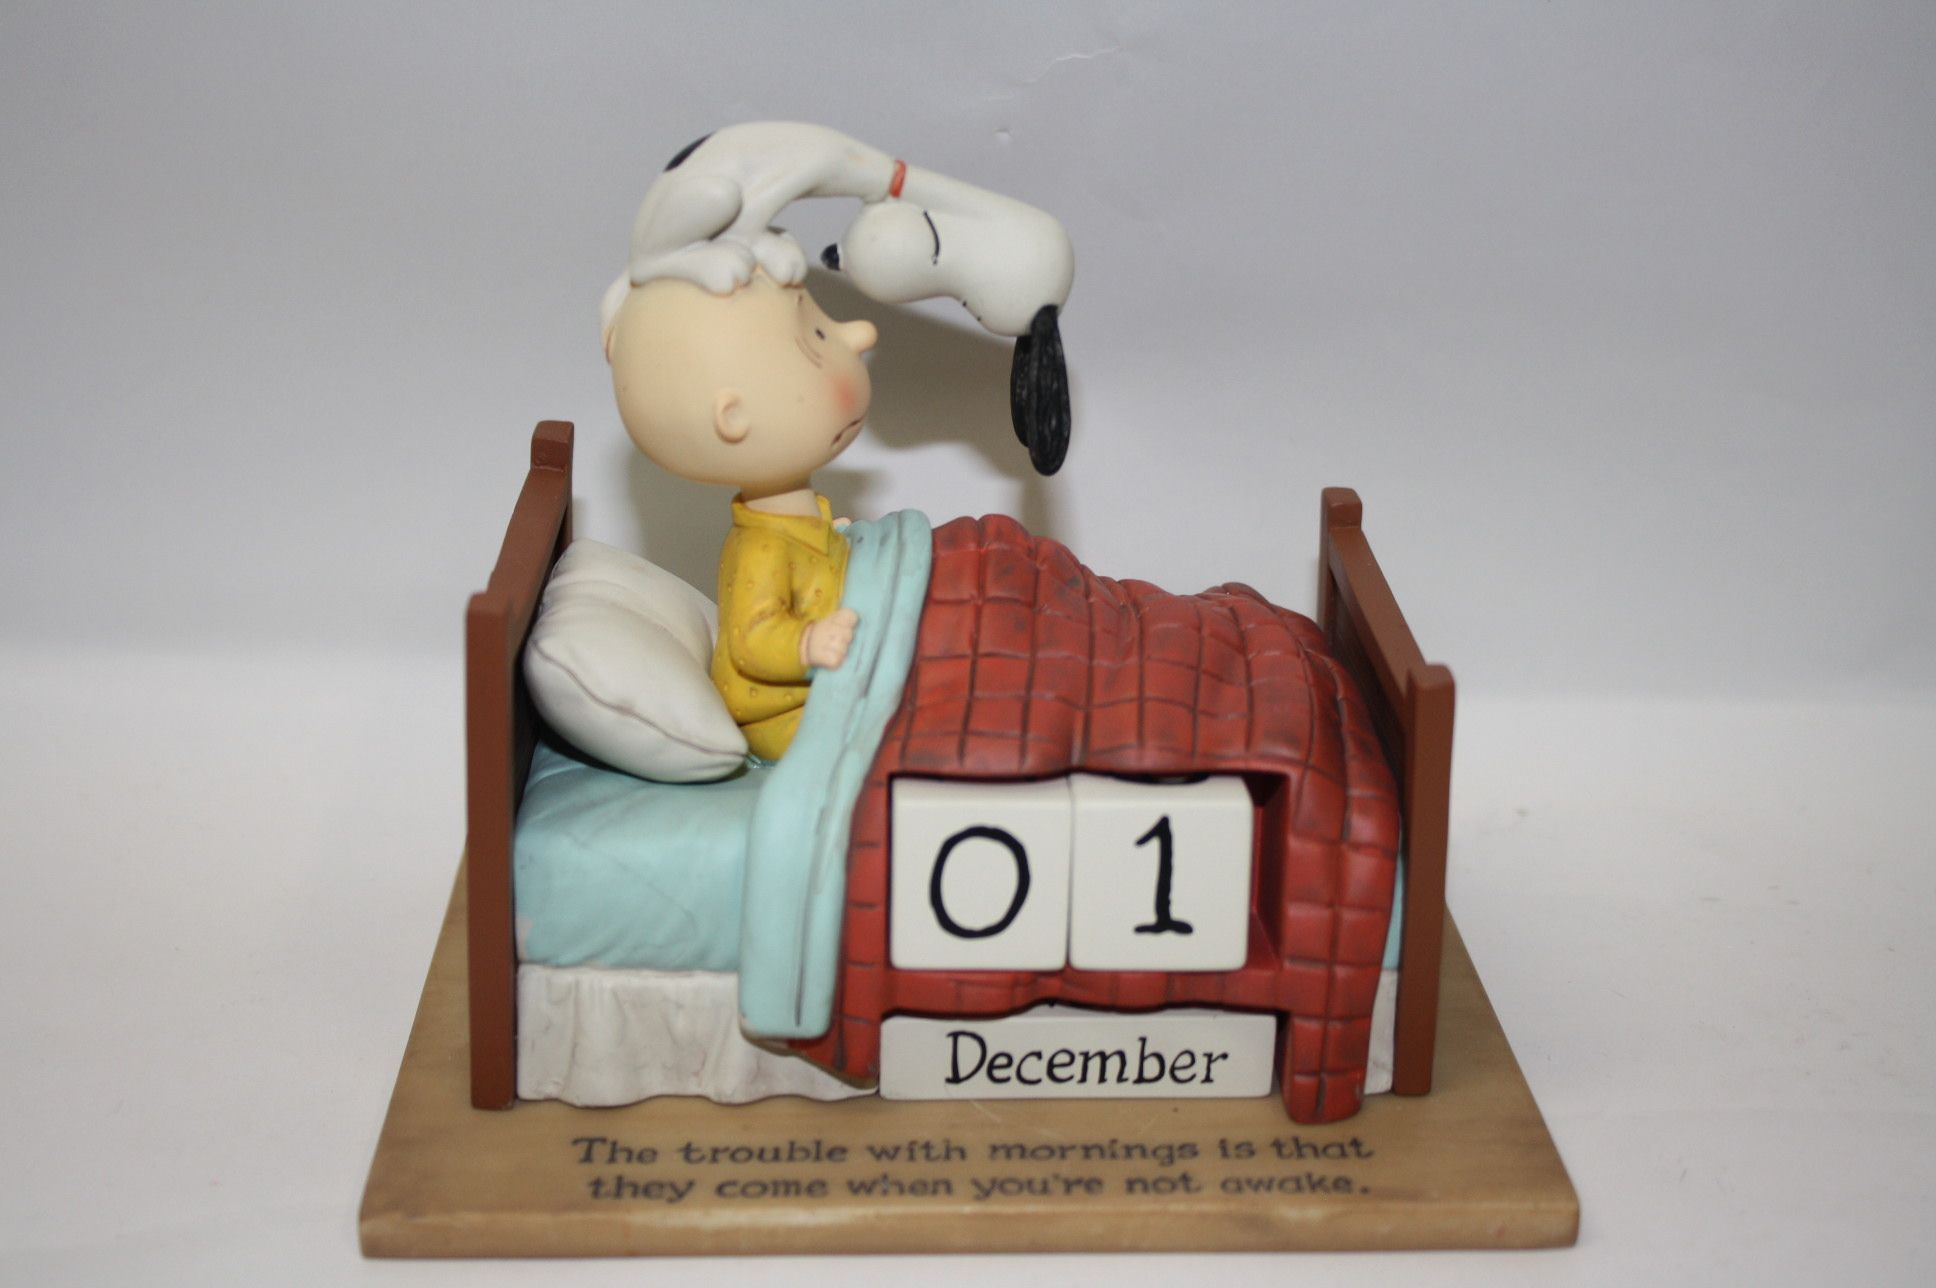 hallmark peanuts collectibles | Hallmark Charlie Brown and Snoopy Perpetual Calendar, 1PAJ4411